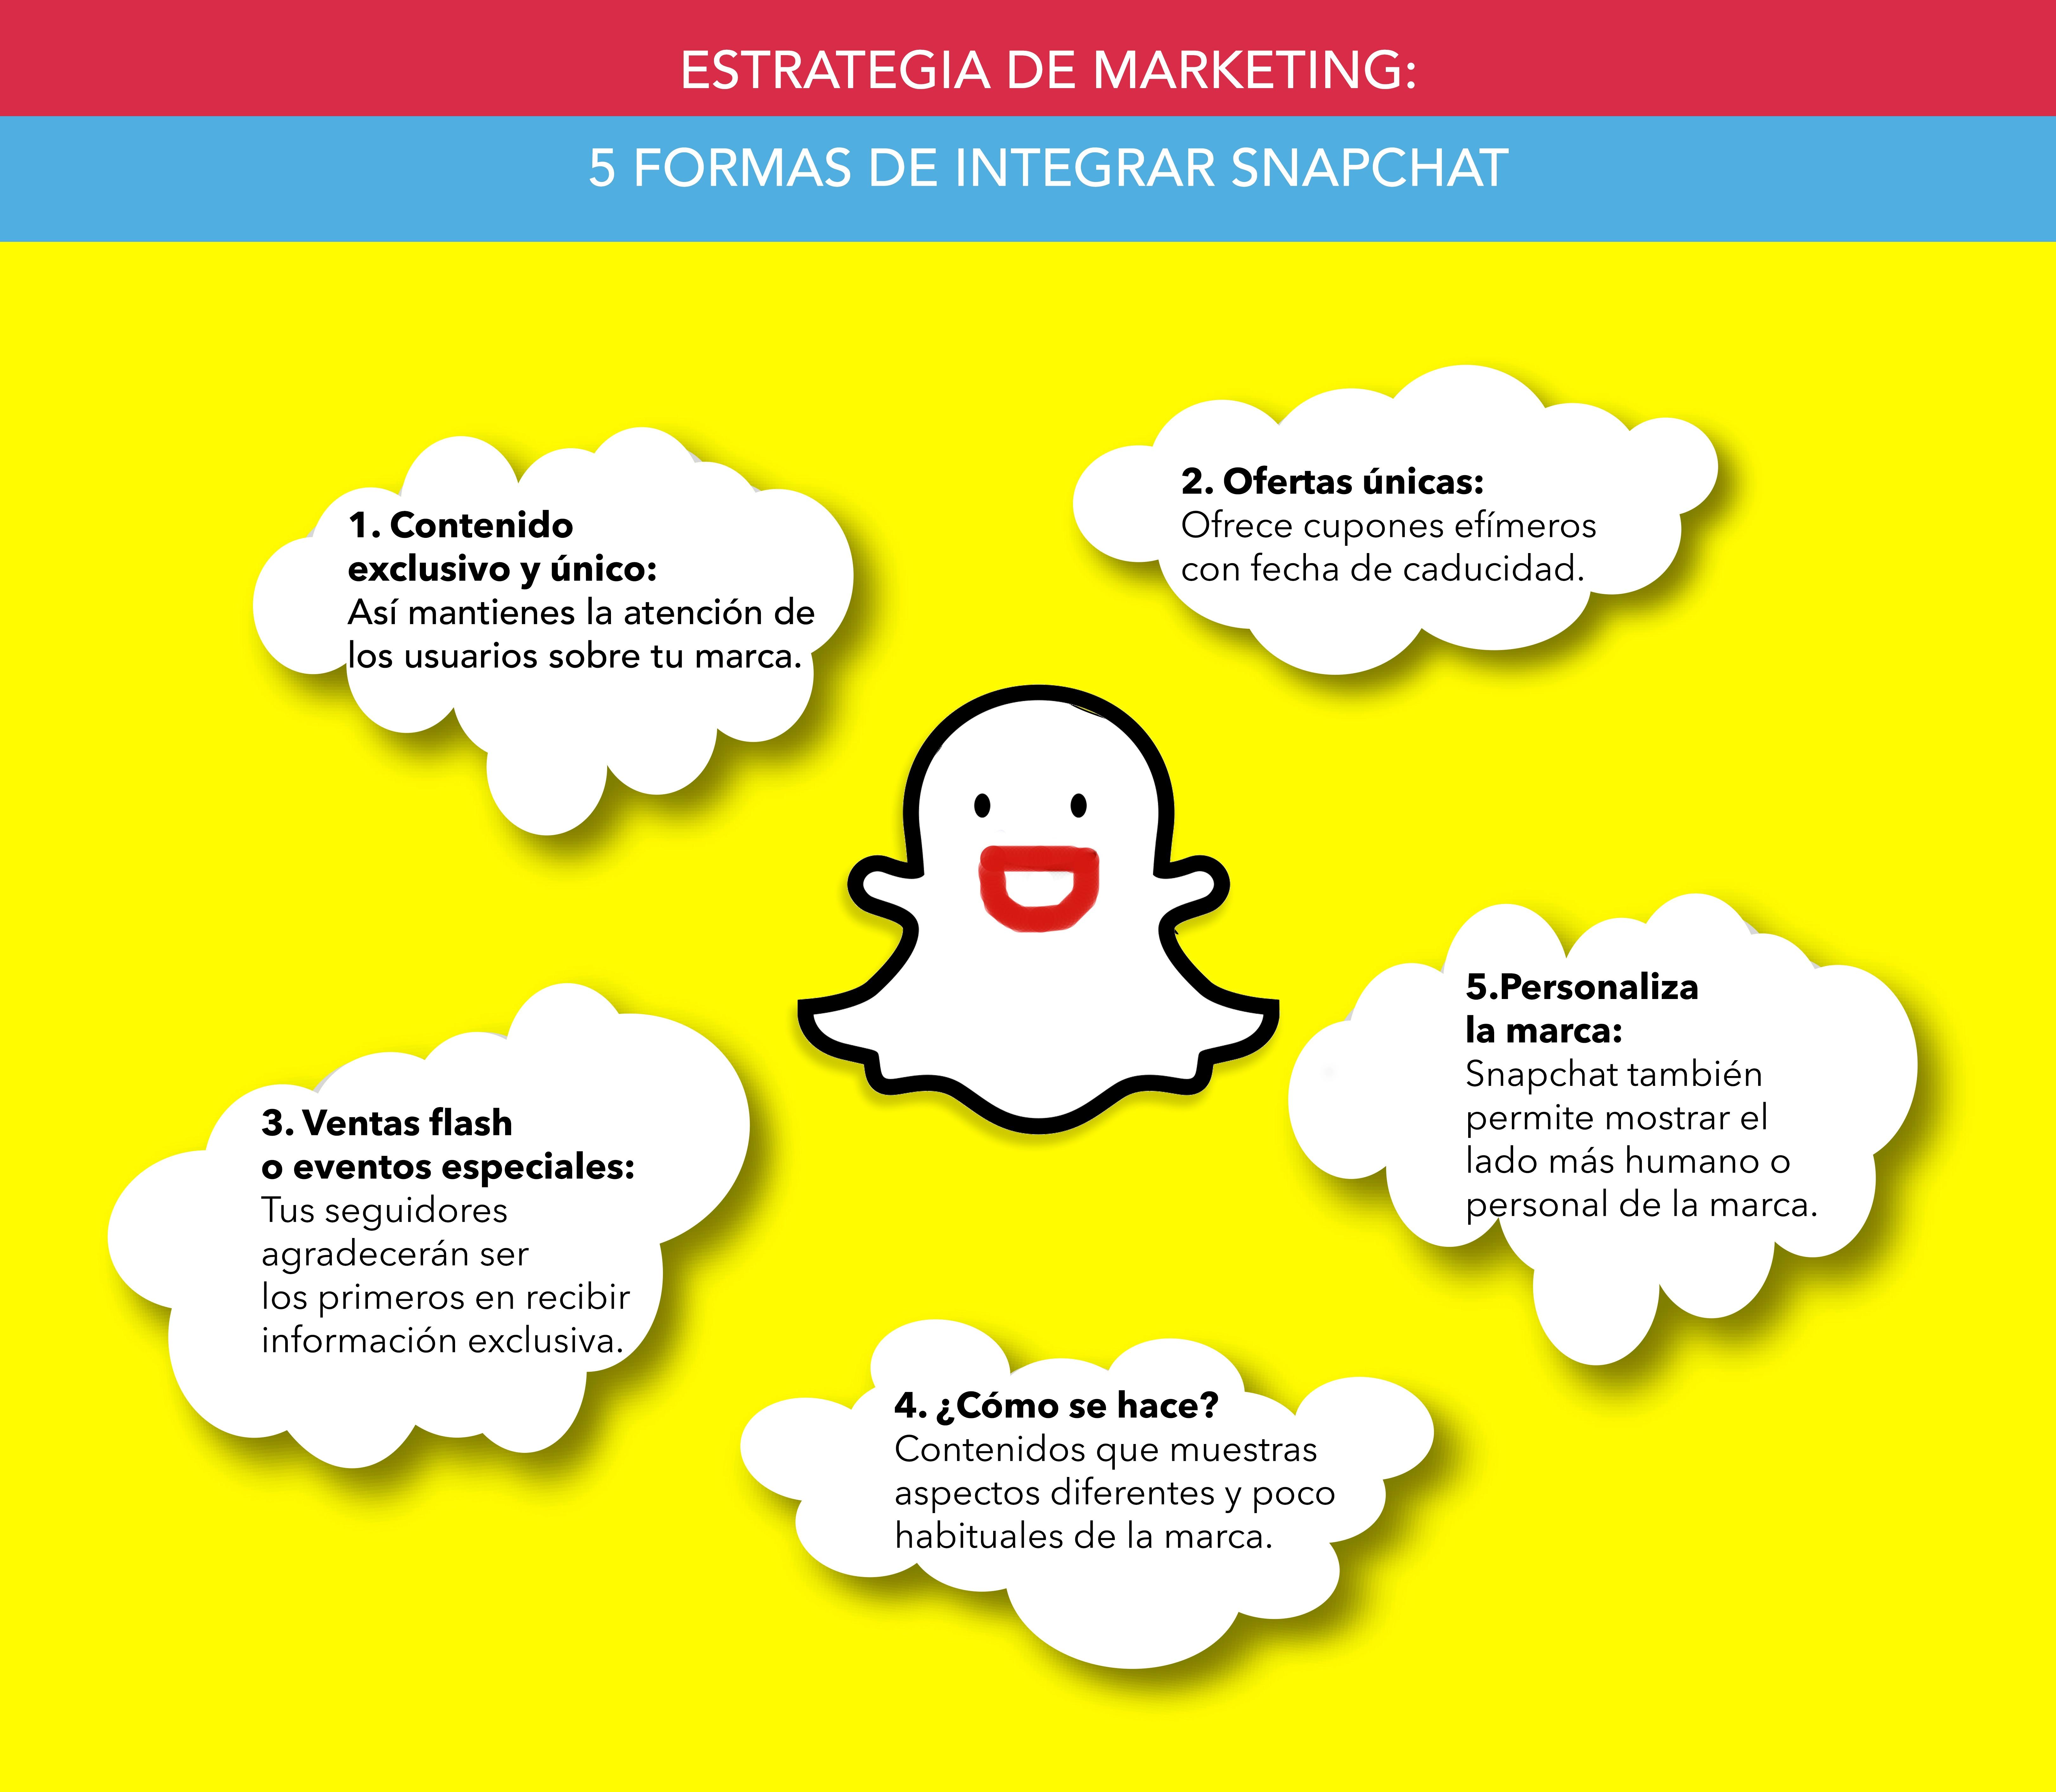 Estrategia de marketing 5 maneras de integrar Snapchat Inforgrafiia